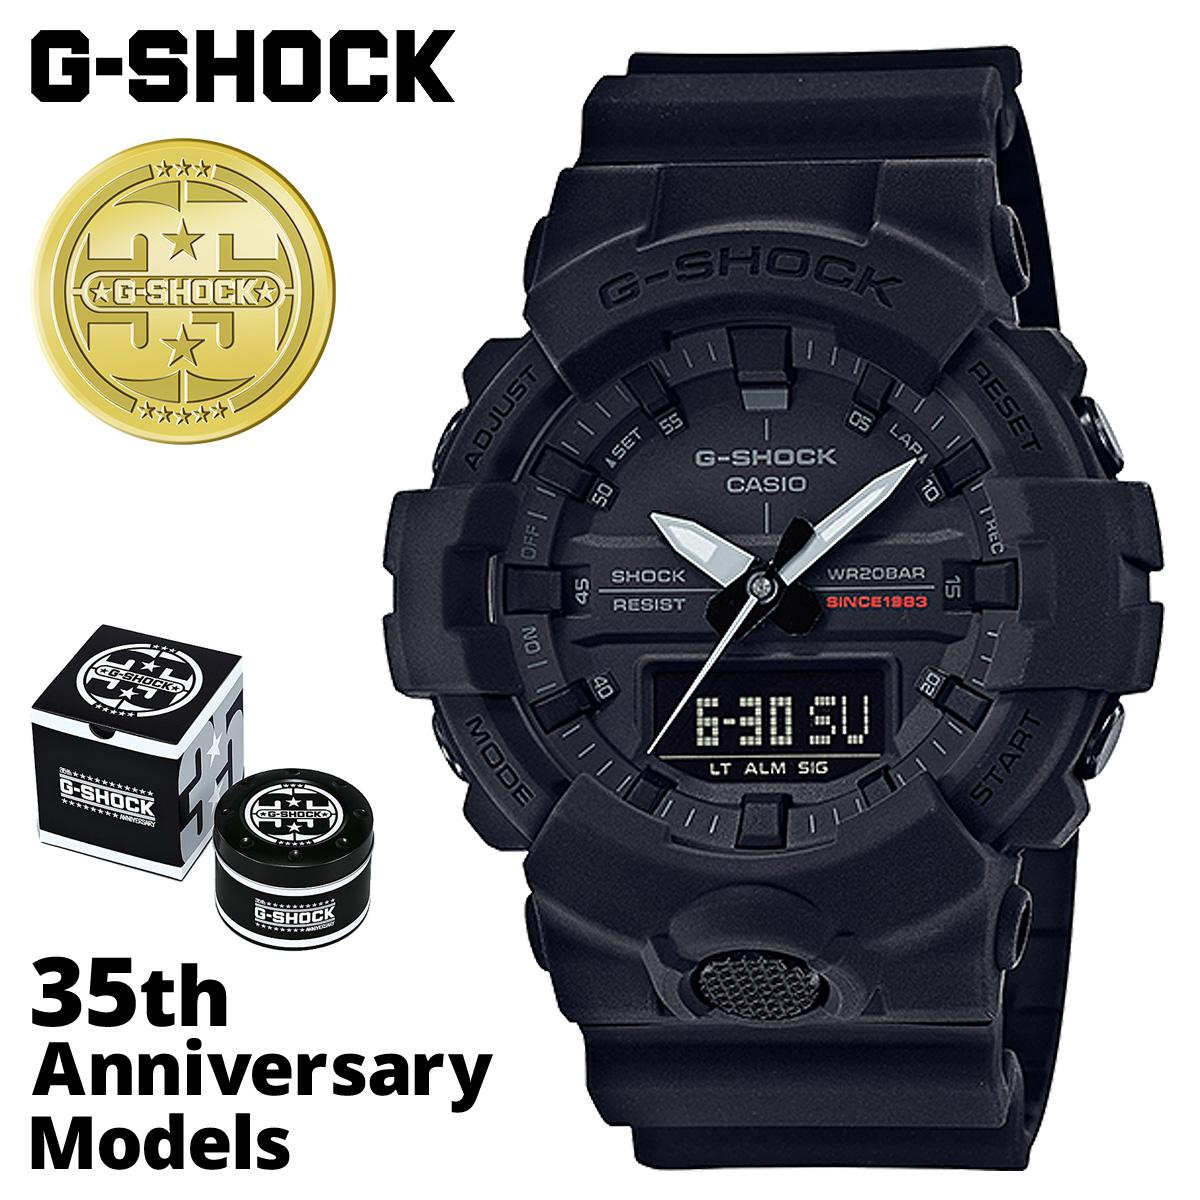 8f280236fa CASIO G-SHOCK ジーショック. Absolute Toughness G-SHOCKが誇るタフの象徴、衝撃構造。  モジュールを宙に浮かせるように包み込む中空構造のケース、落下衝撃から ...